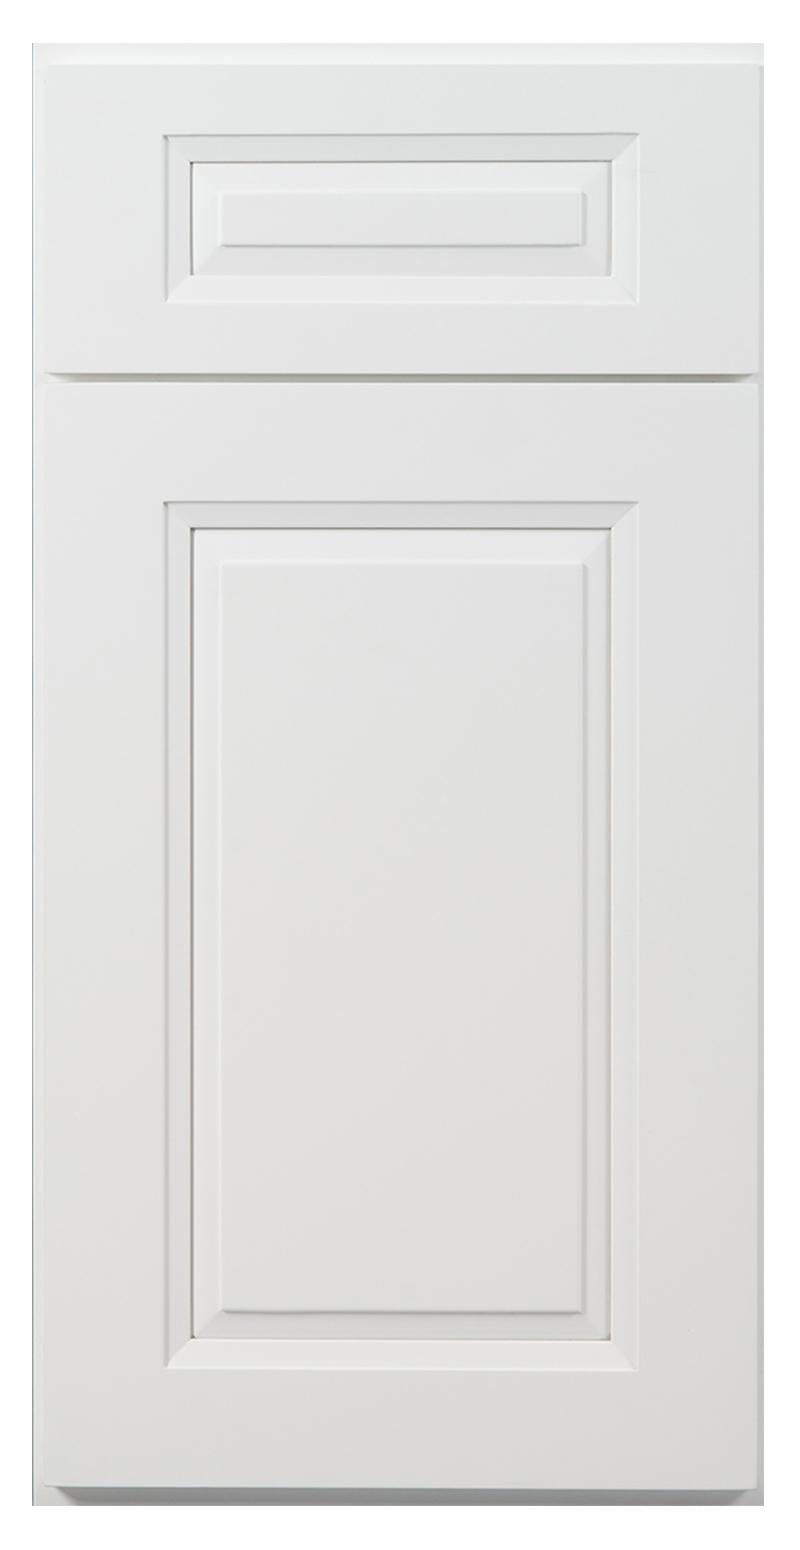 Raised Panel Door Style White